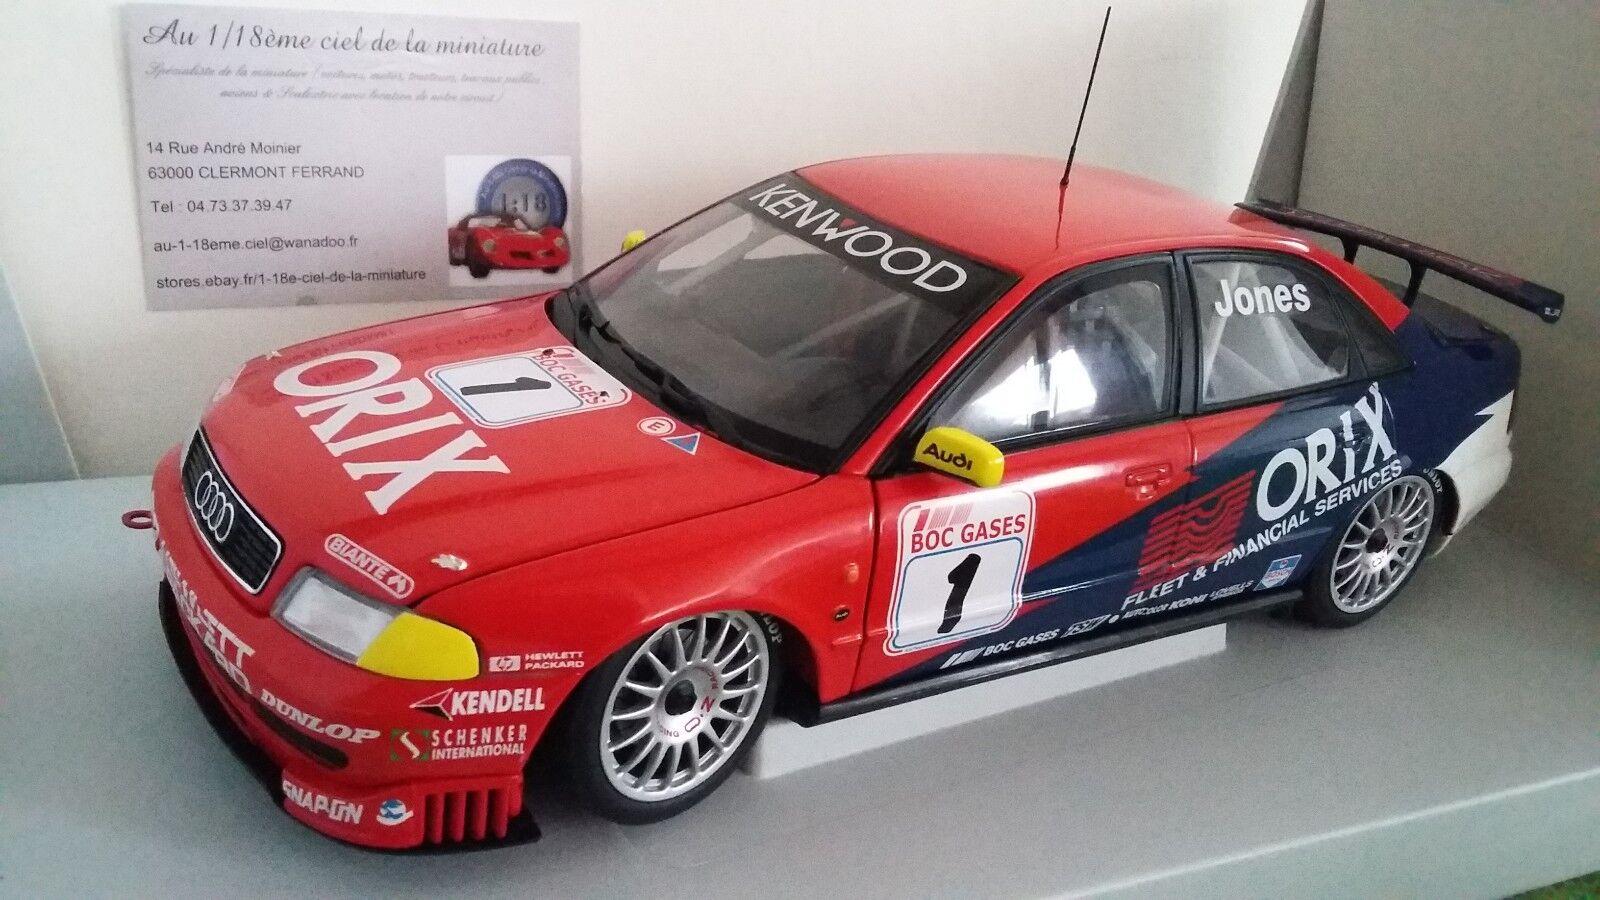 salida de fábrica AUDI A4 STW ORIX JONES 1997 1 18 18 18 UT Models 39745 voiture miniature de collection  ¡envío gratis!